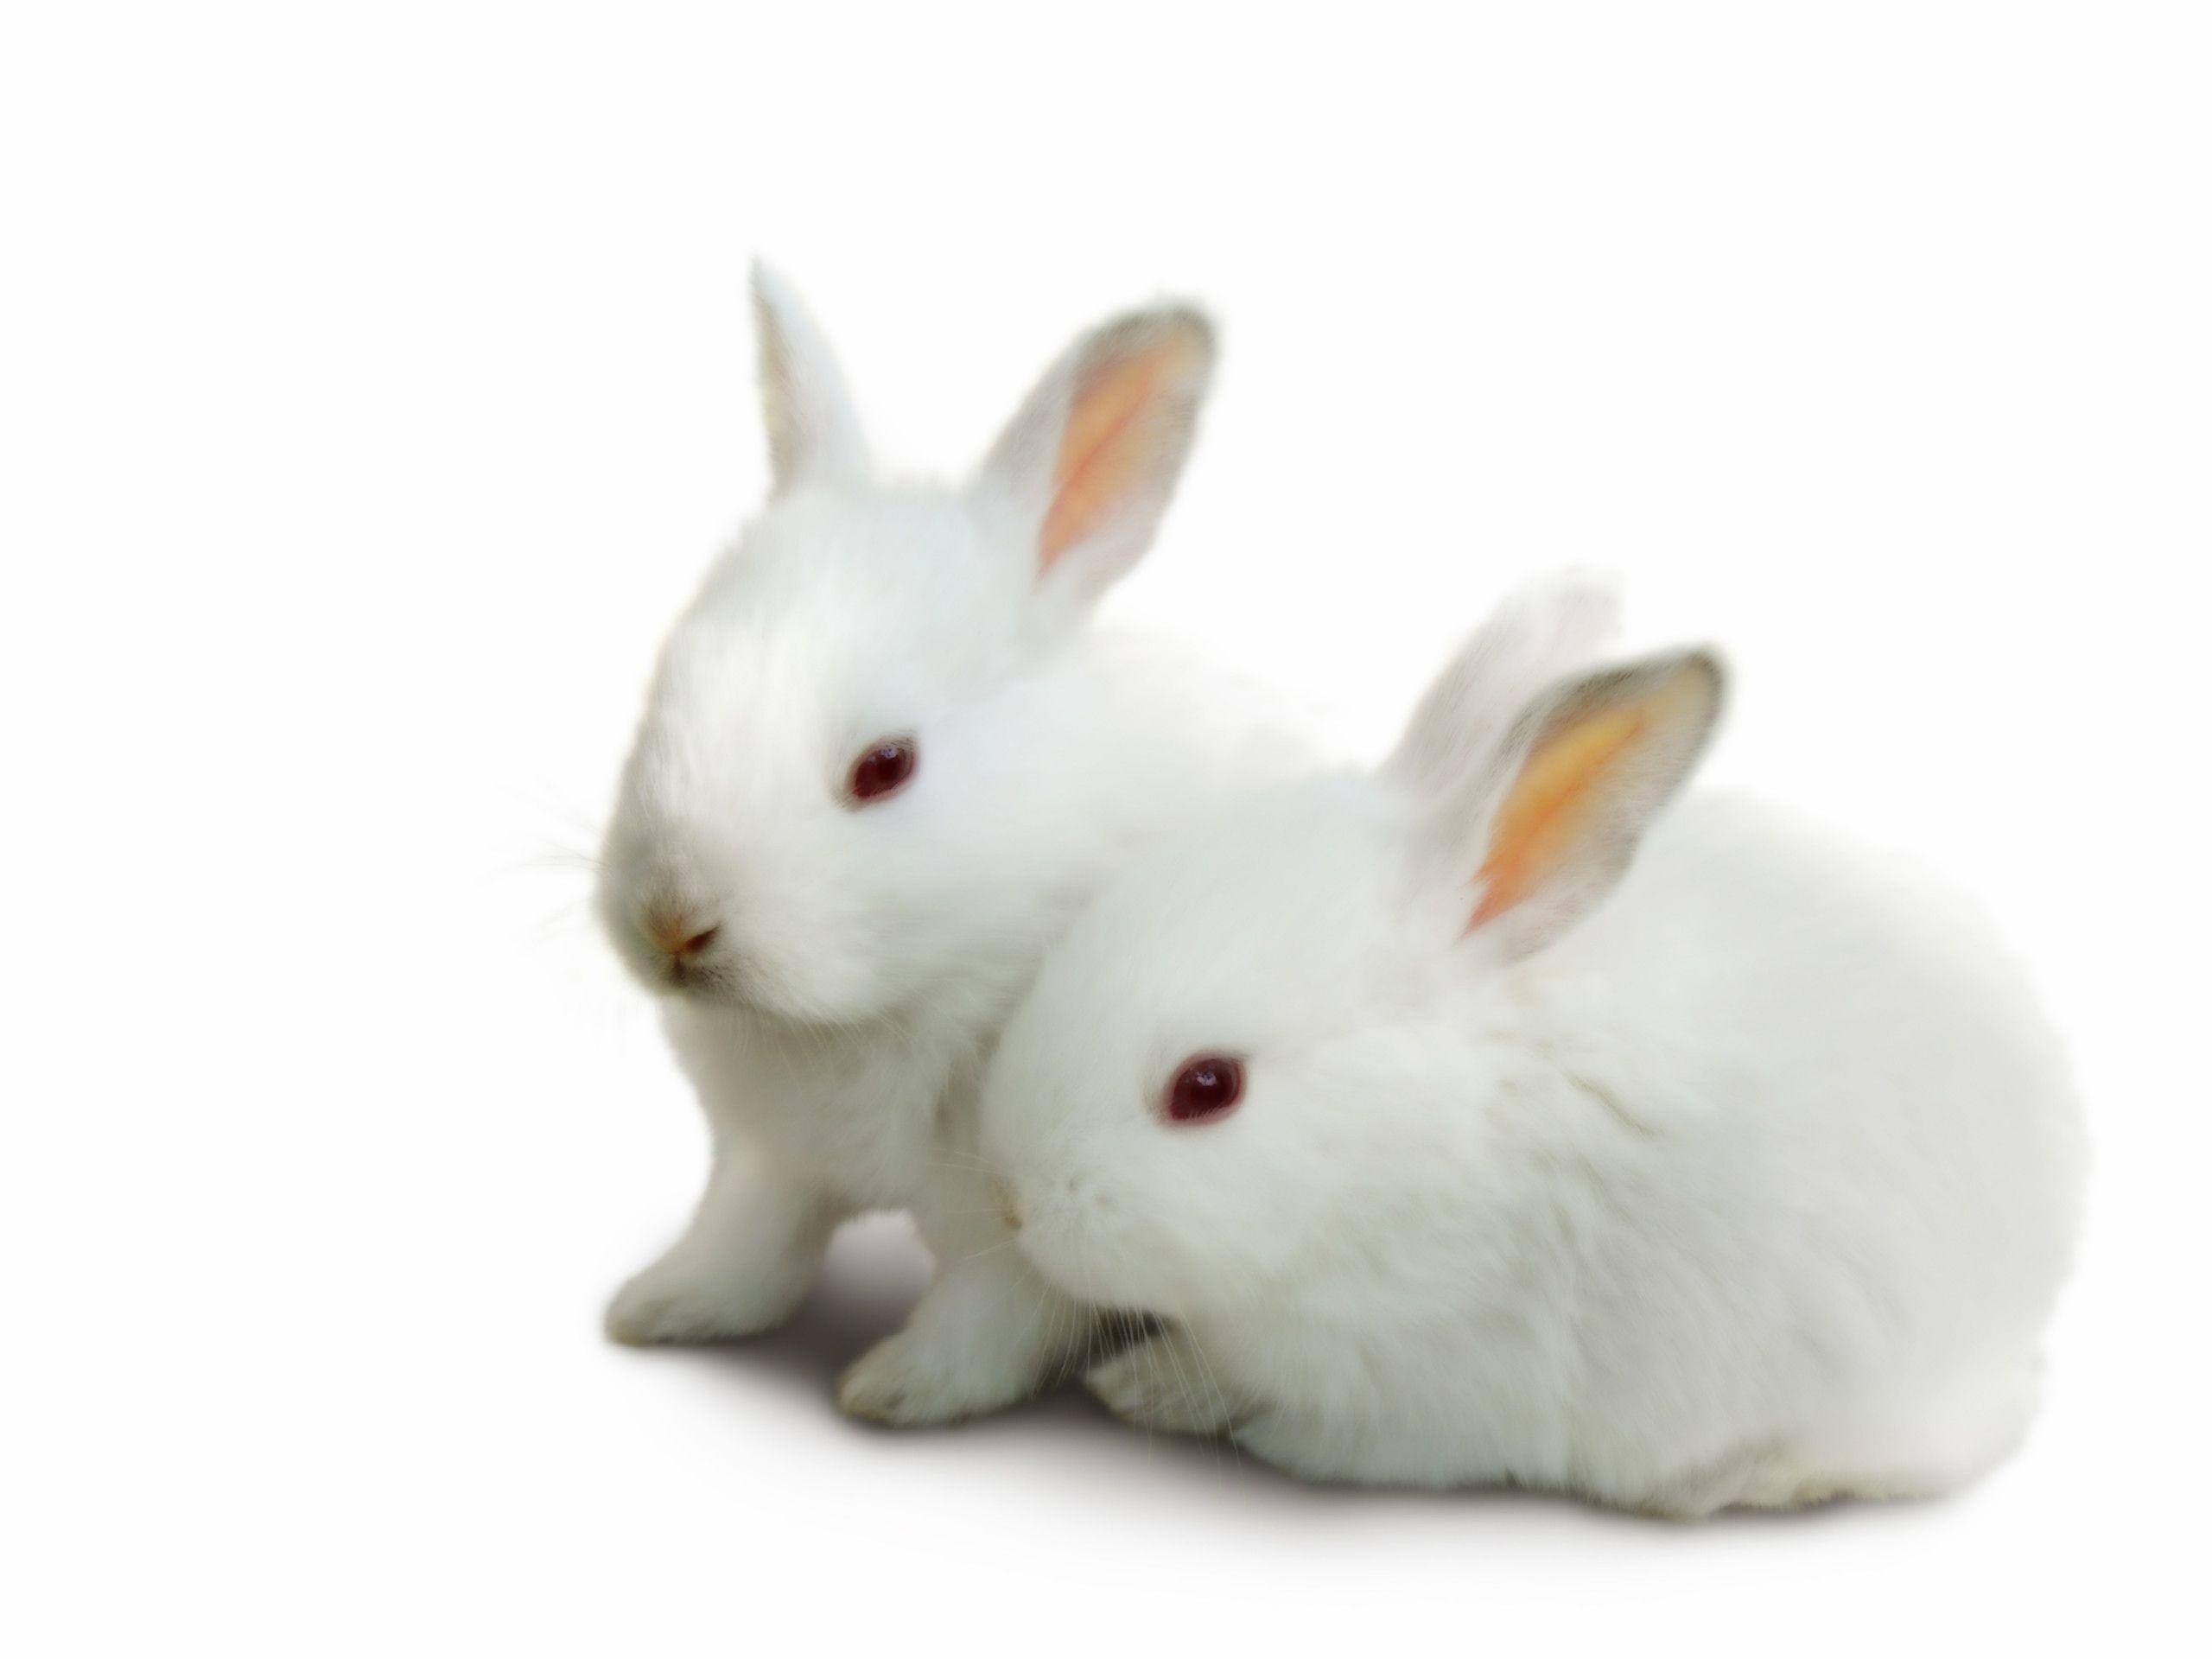 Image Baby Bunny Rabbit Wallpaper HD, Wallpapers, HD Wallpapers .